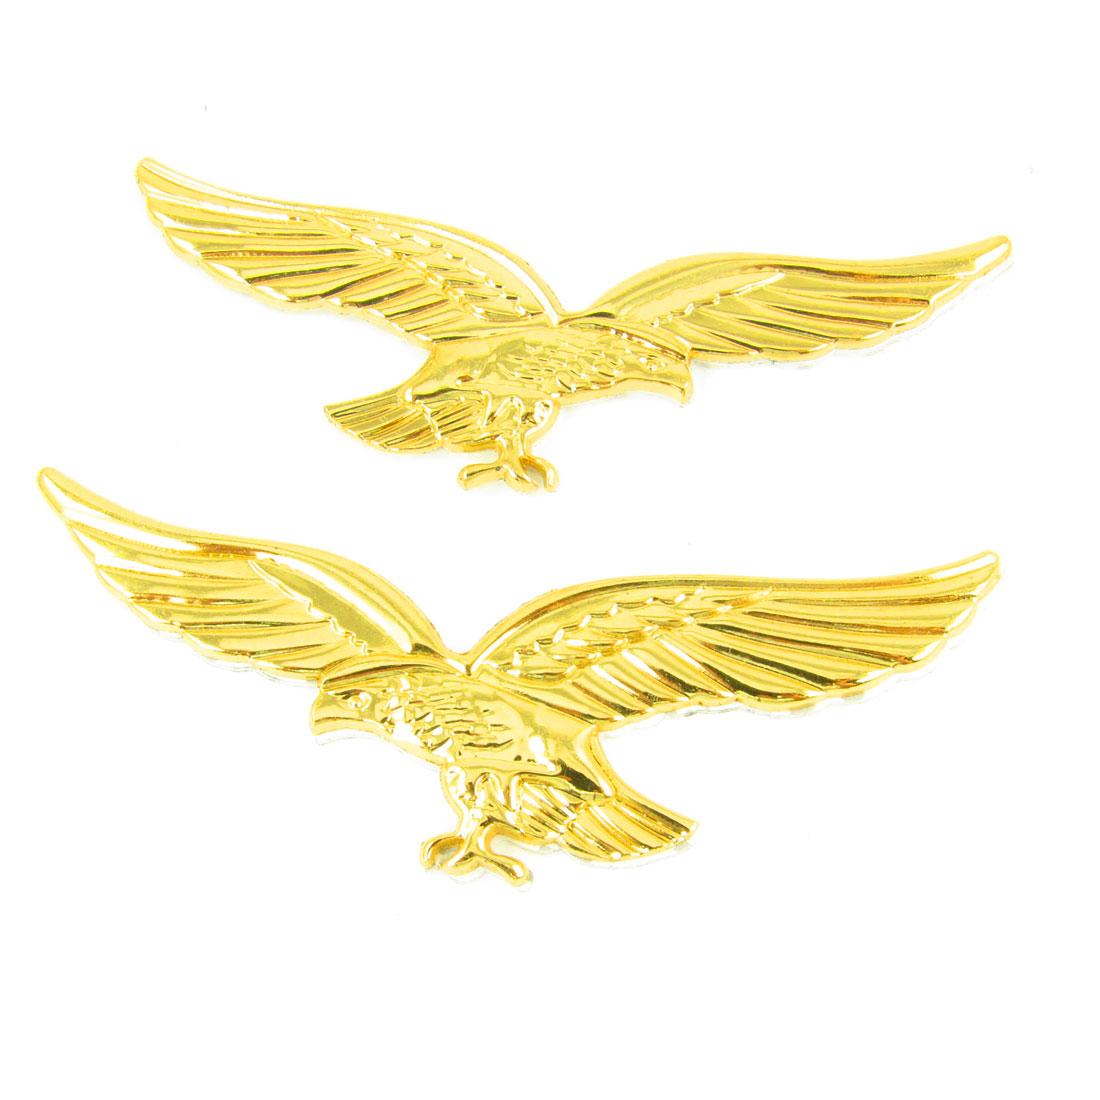 2pc Gold Tone Eagle Shaped Metal Decorative Sticker for Auto Car